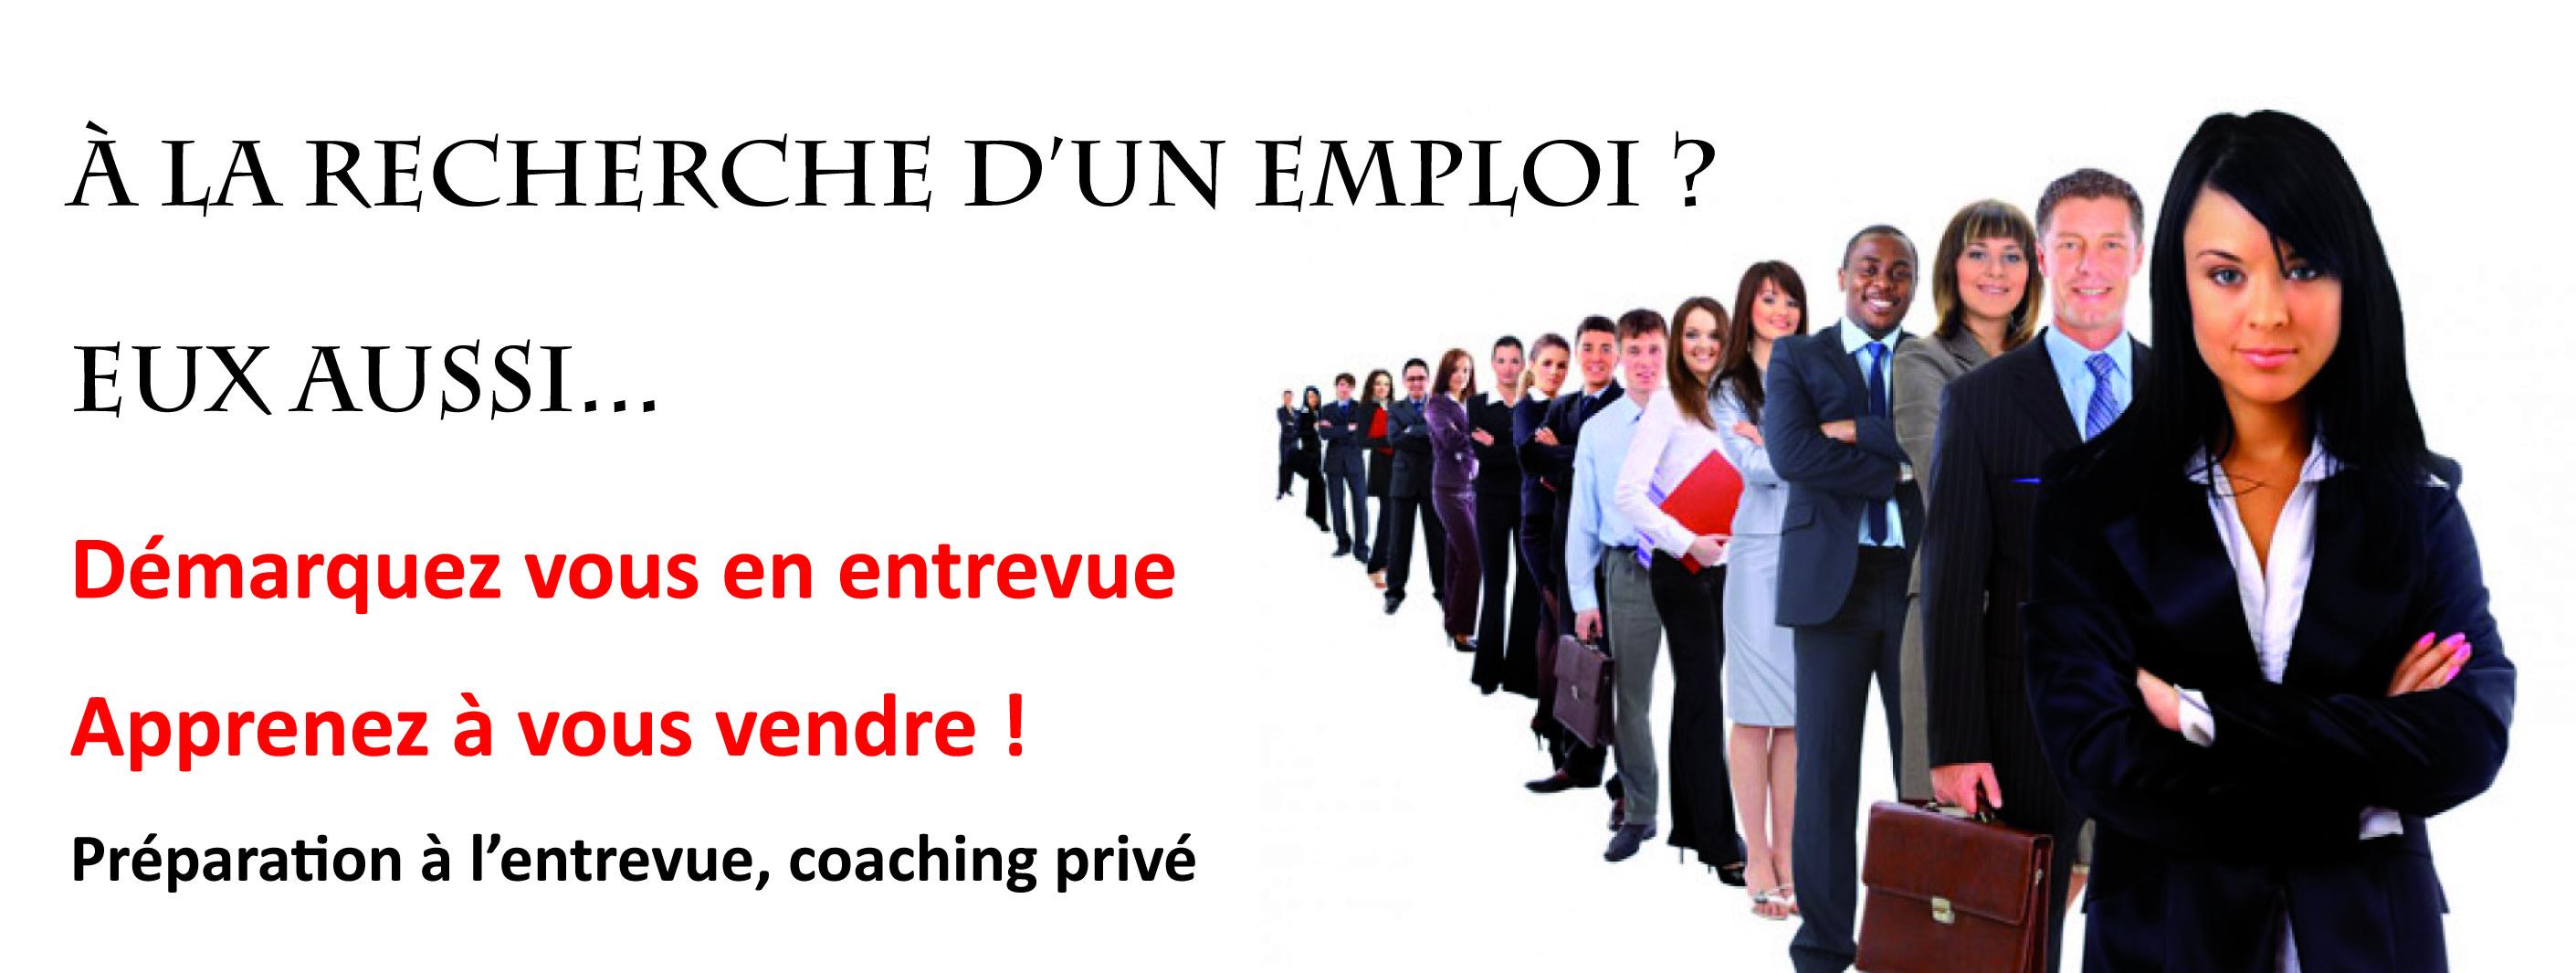 entrevue-emploi